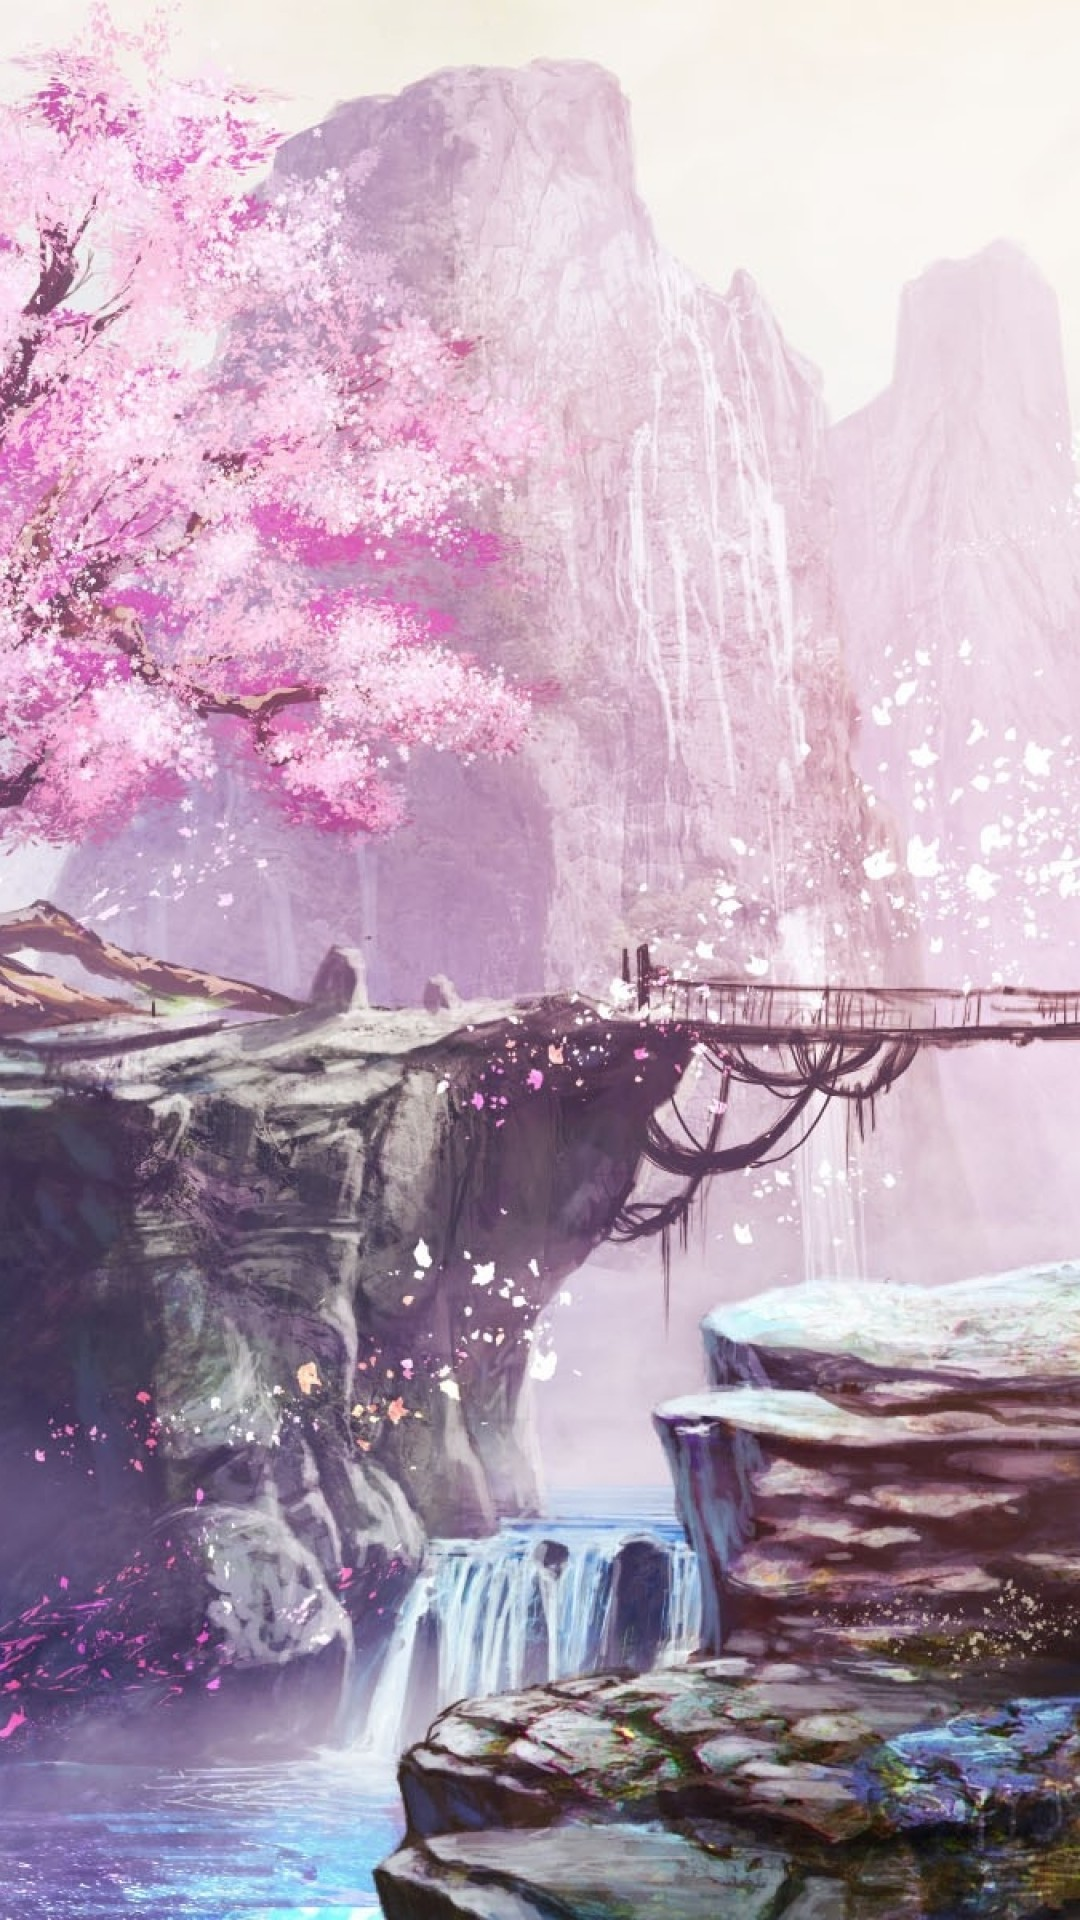 Anime Landscape, Cherry Blossom, Bridge, Waterfall, Anime Girl, Nature